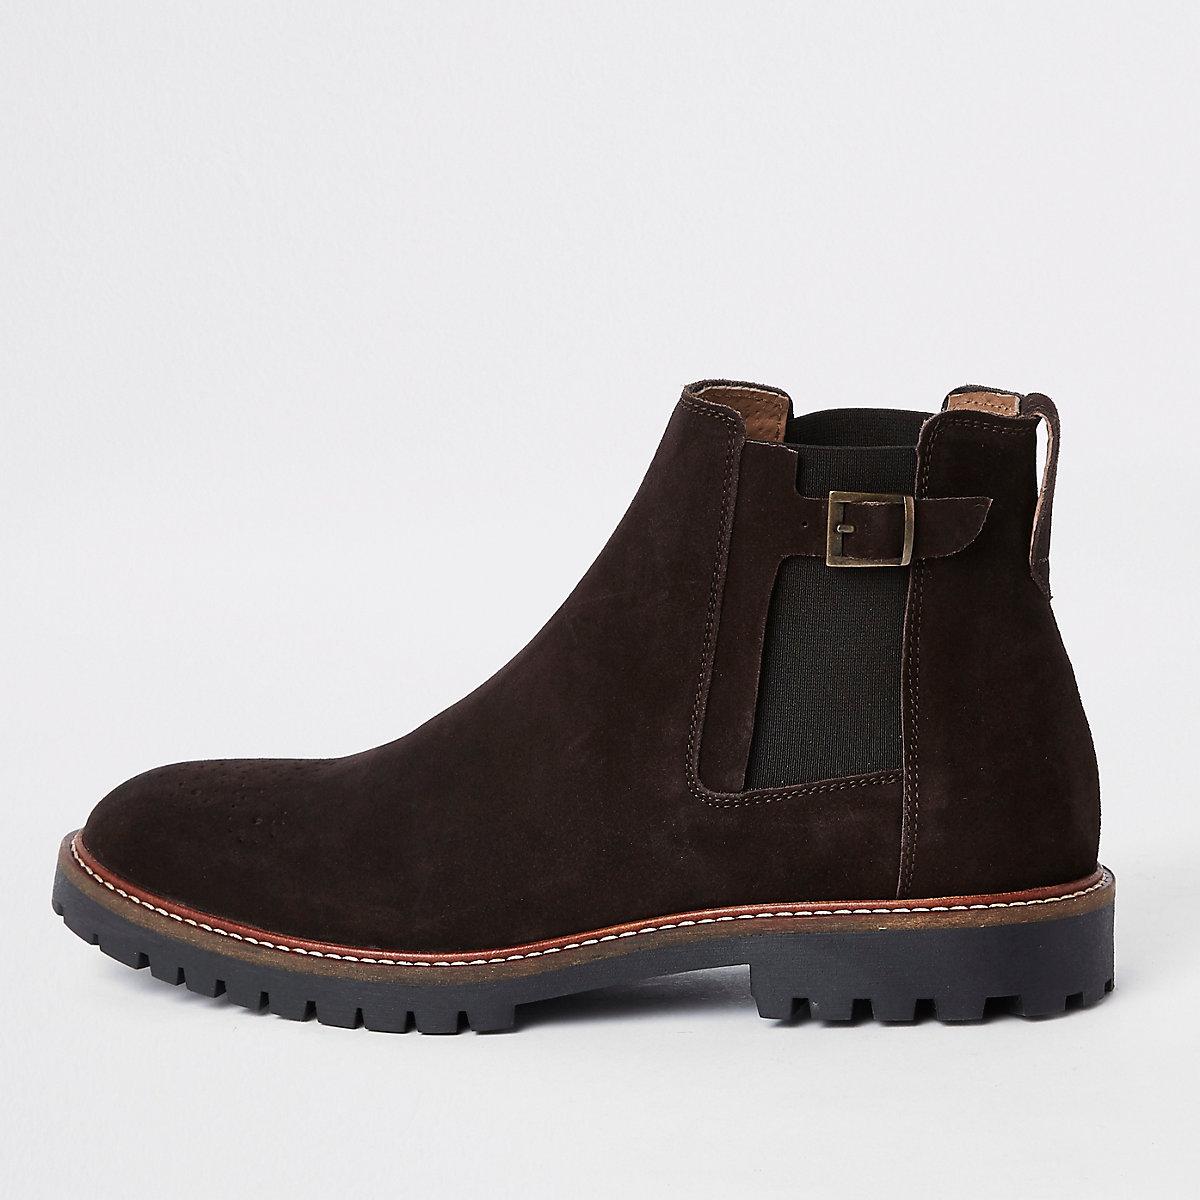 Dark brown suede sprayed toe chelsea boots